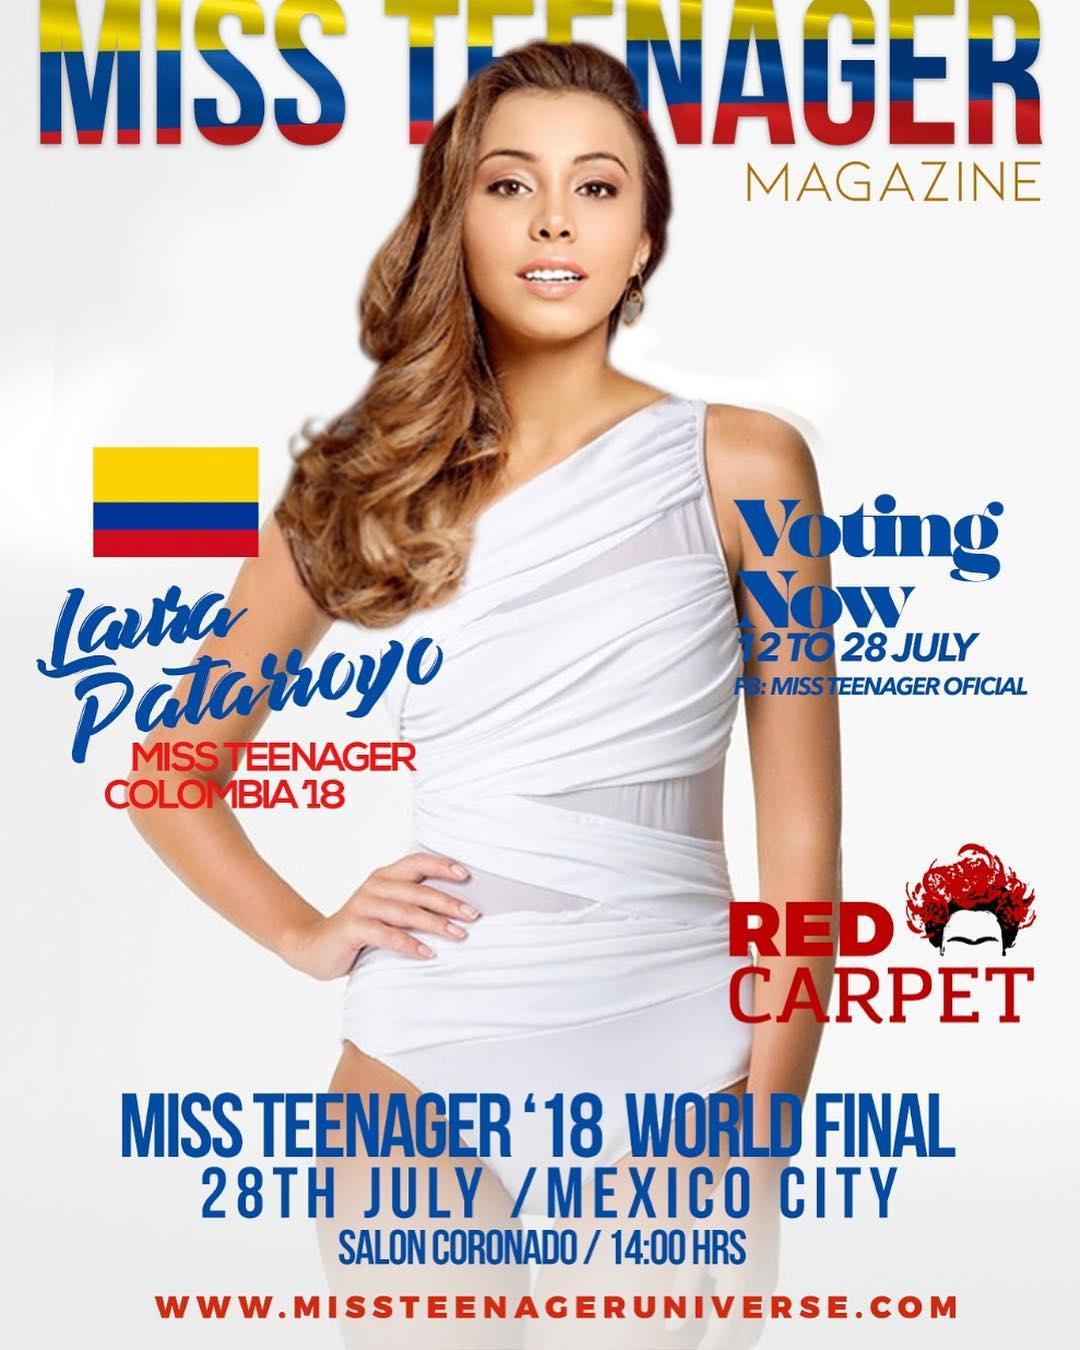 valentina patarroyo, miss teenager 2018. - Página 2 36740410